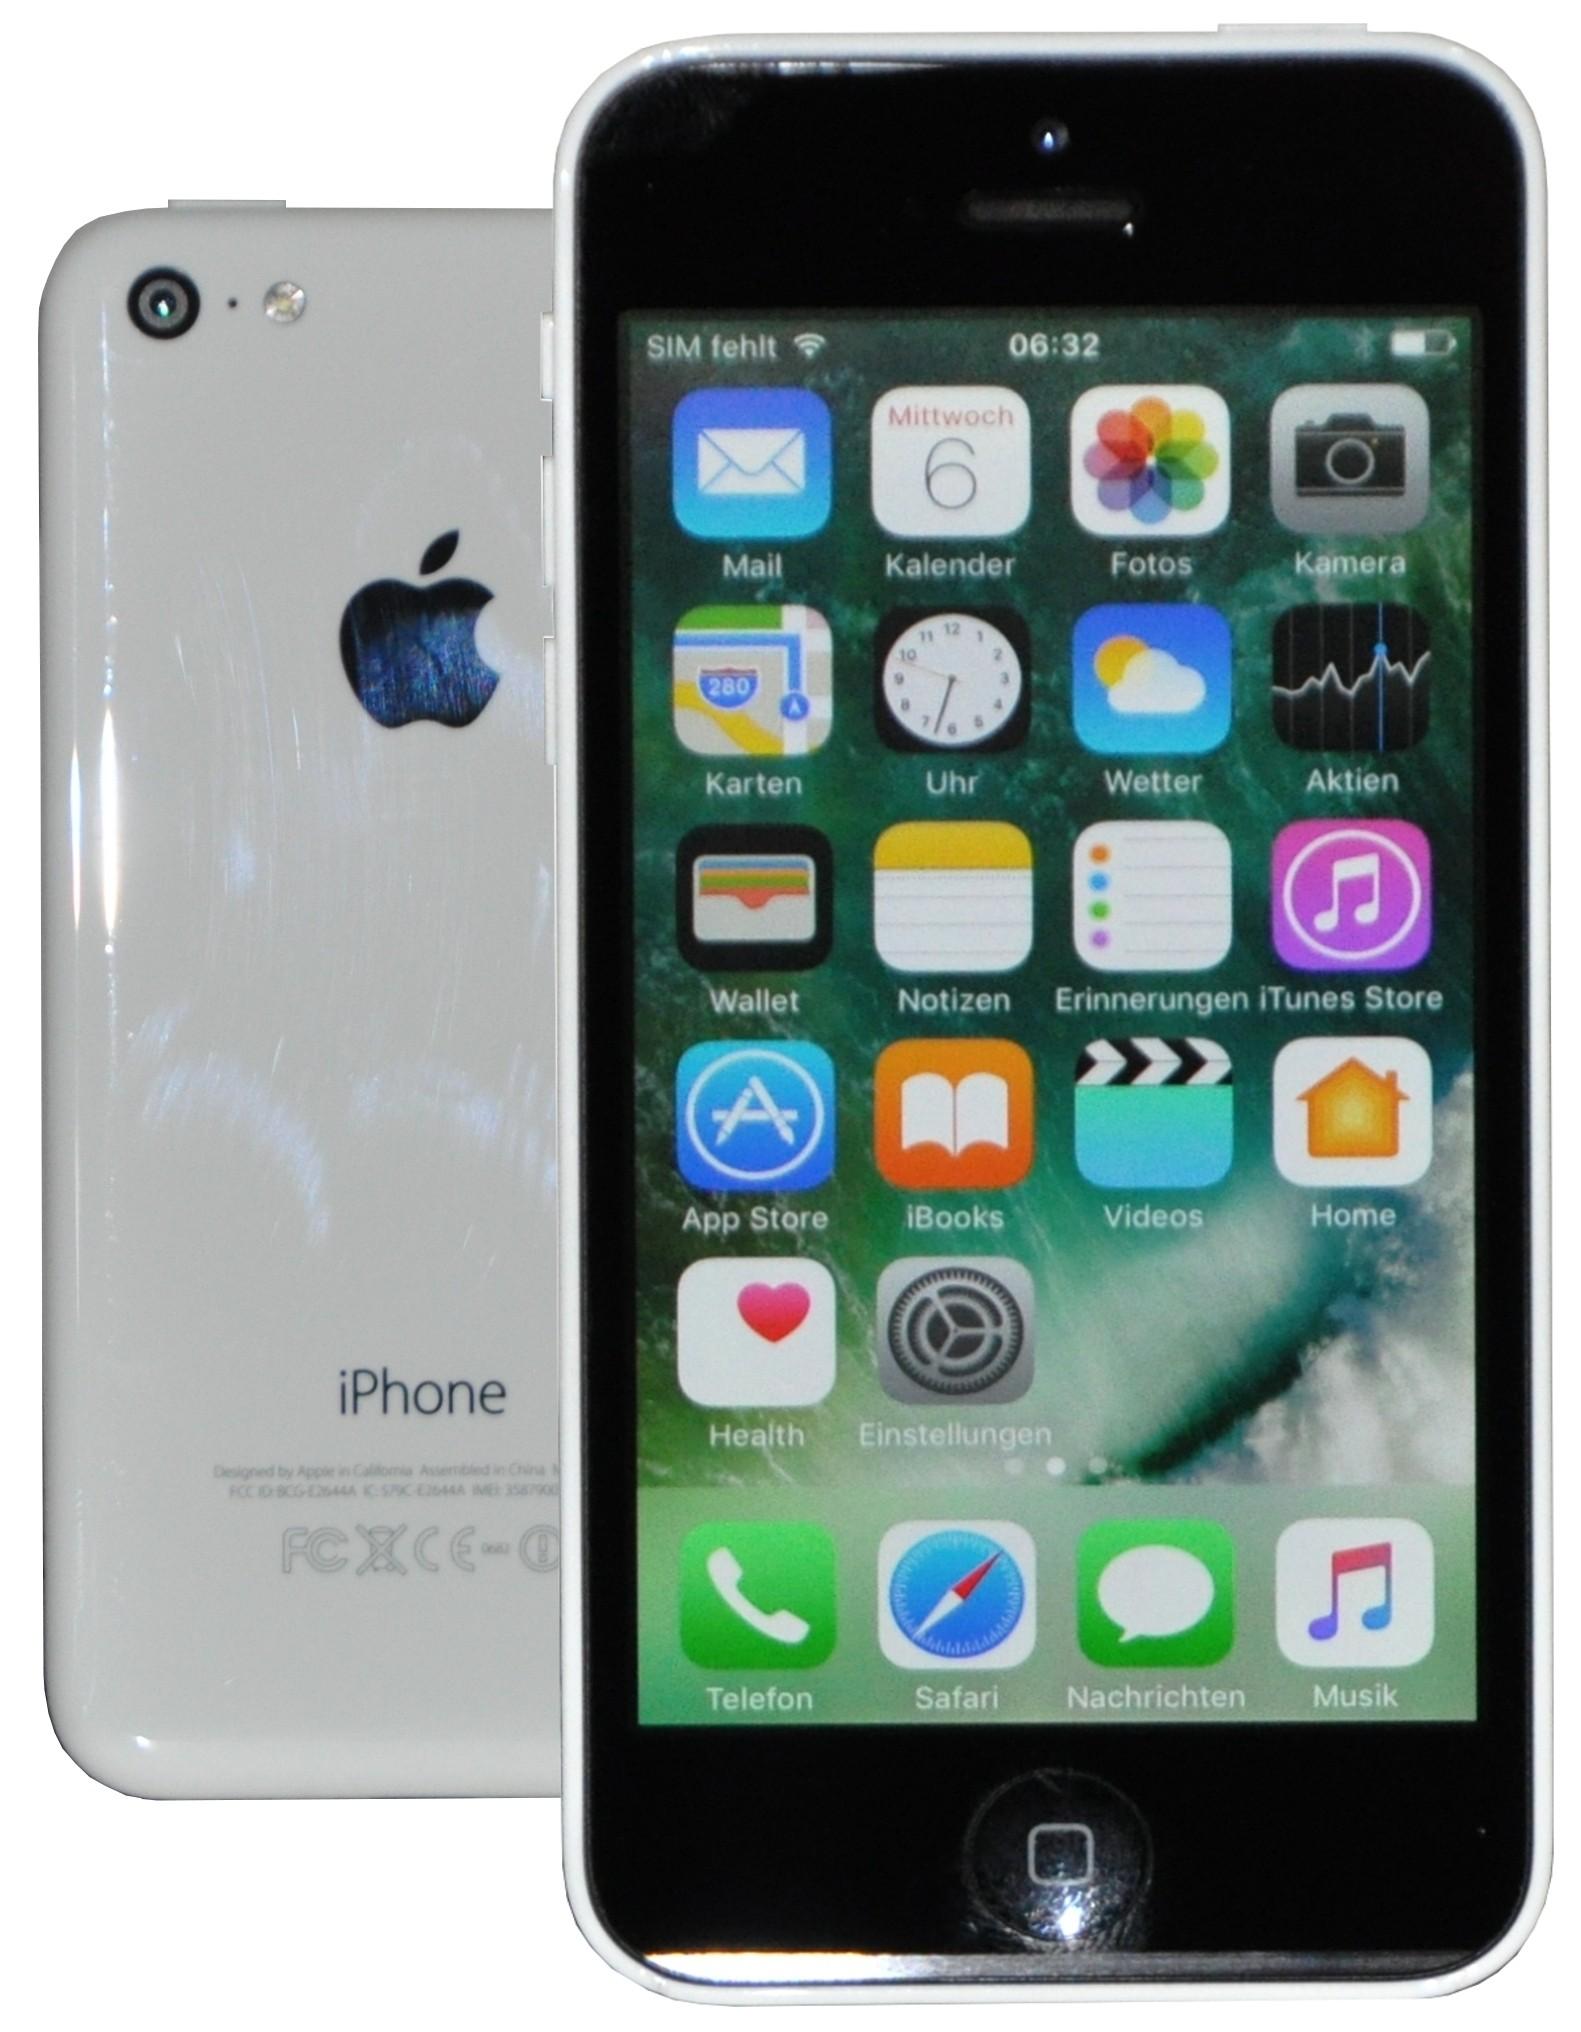 apple iphone 5c gebraucht g nstig kaufen eu computer. Black Bedroom Furniture Sets. Home Design Ideas